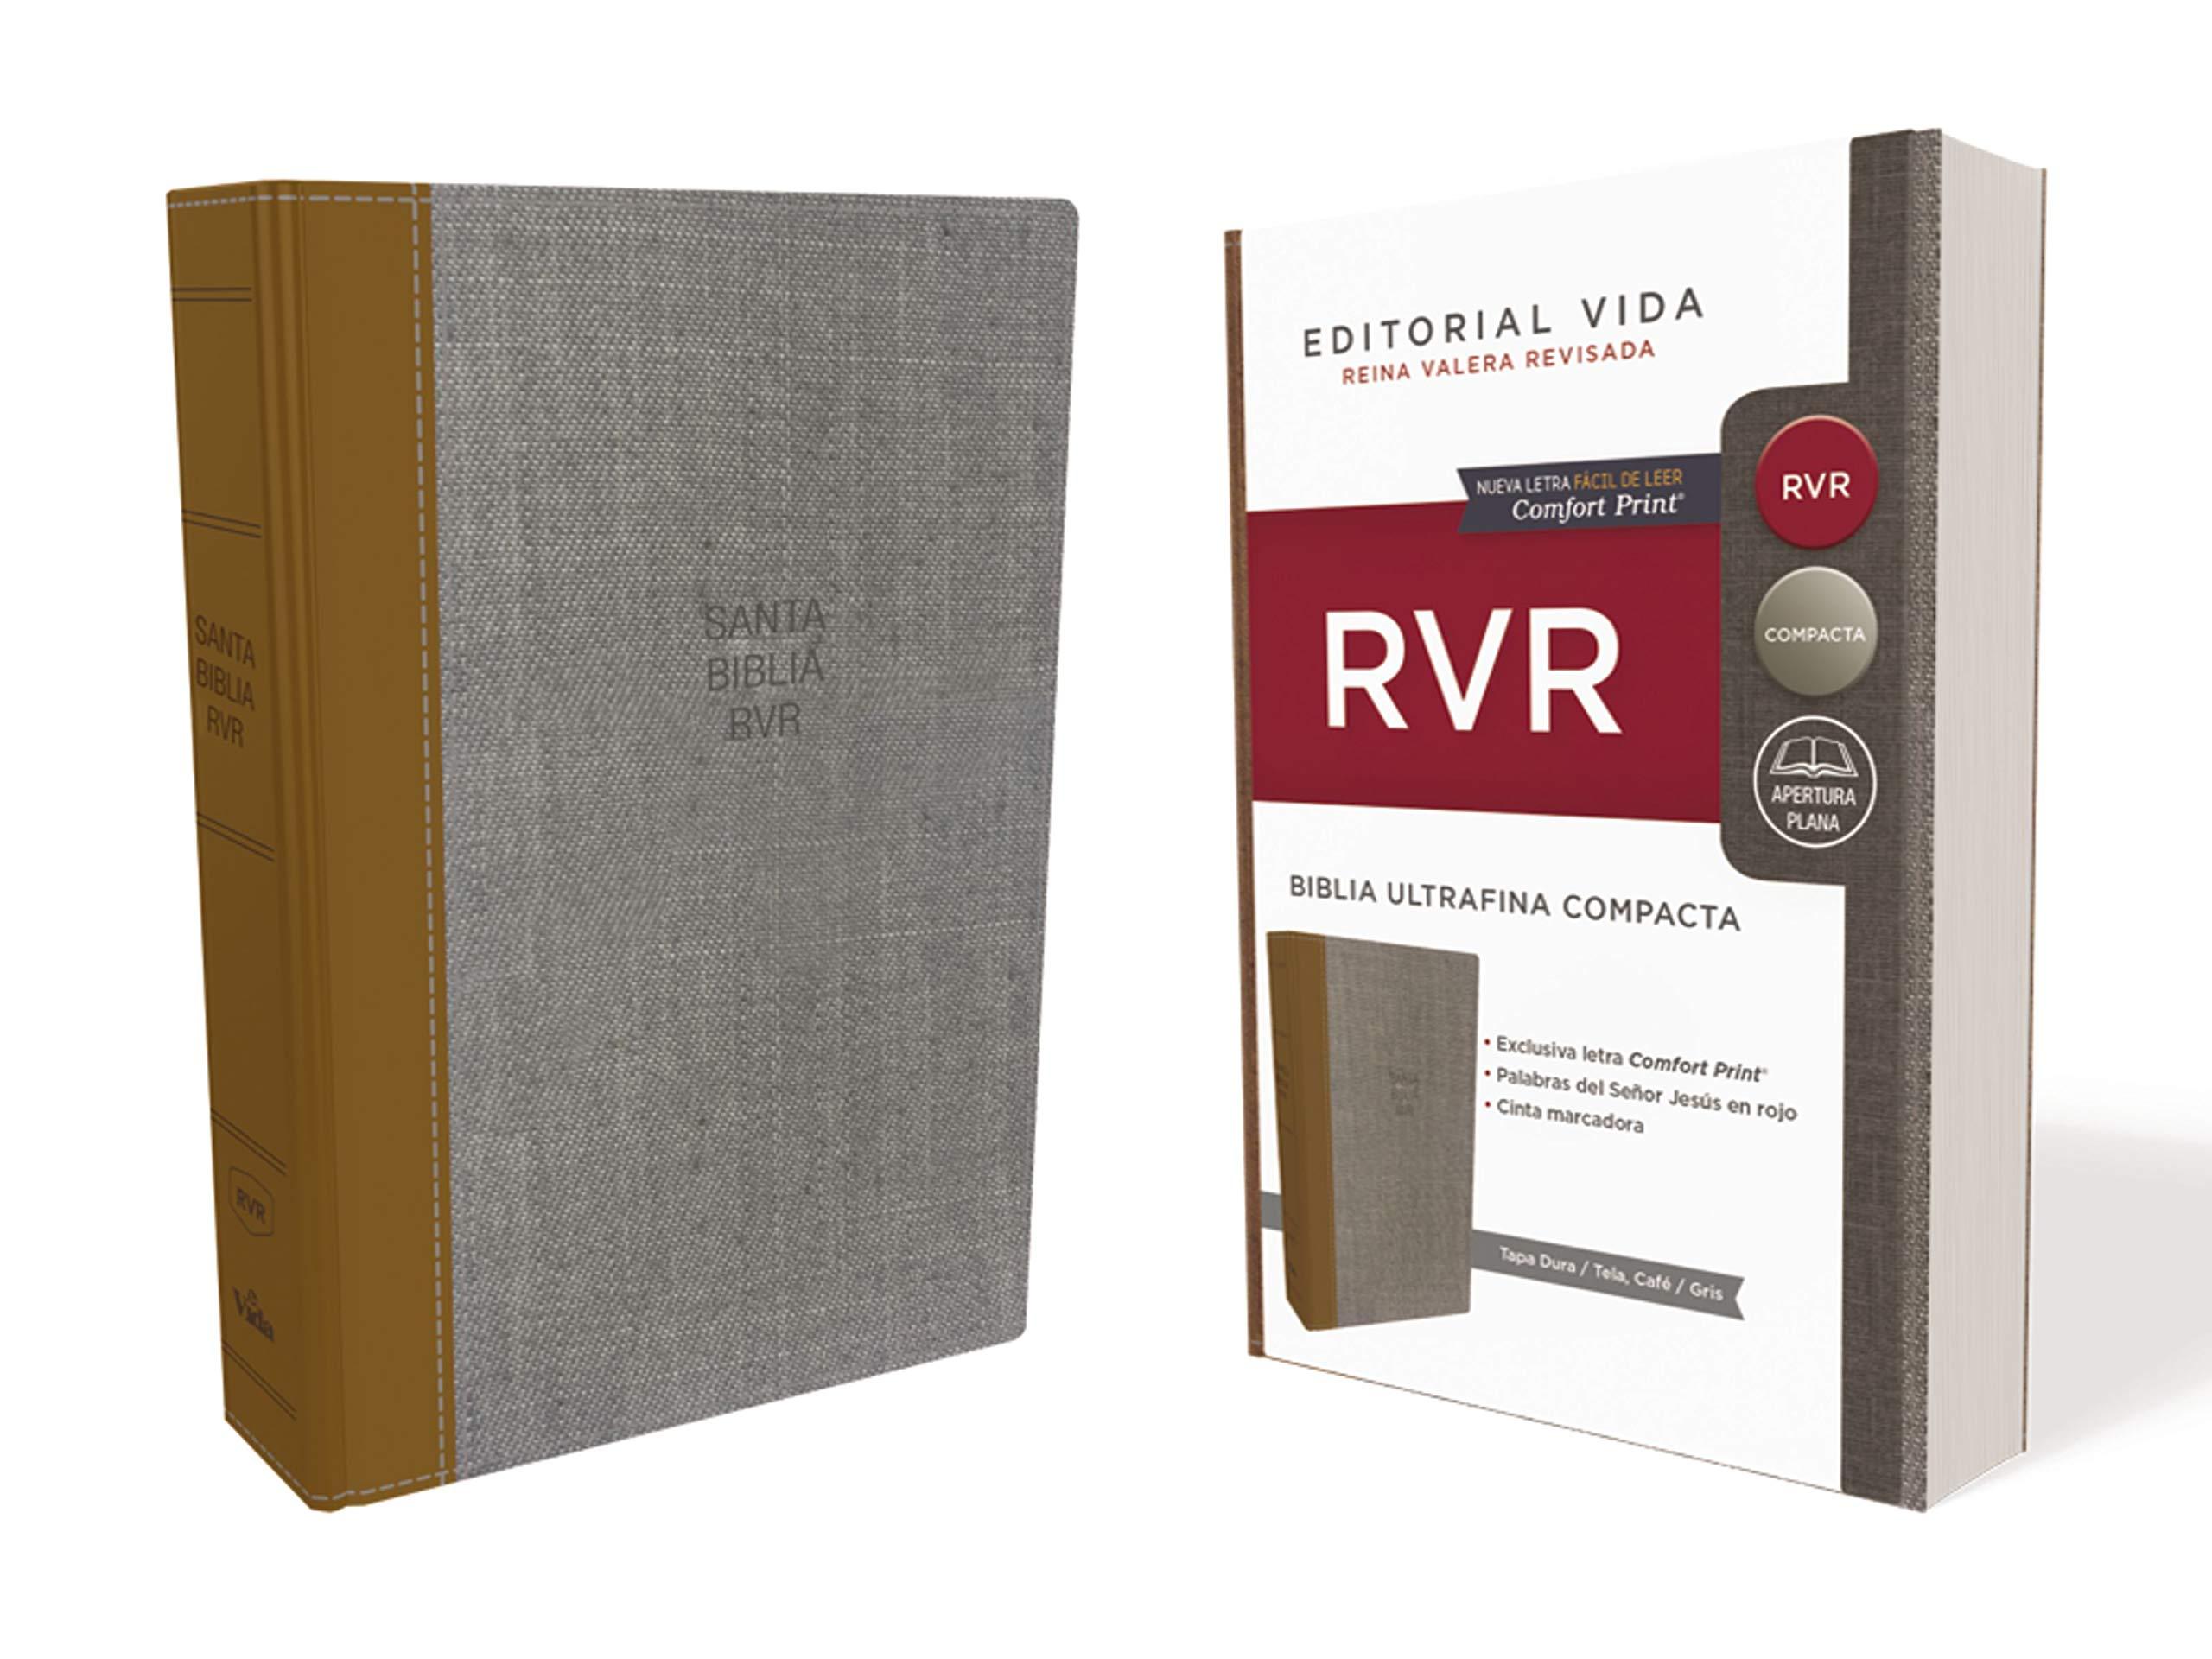 RVR Santa Biblia Ultrafina Compacta, Tapa Dura / Tela (Spanish Edition): Reina Valera Revisada: 9781404110304: Amazon.com: Books